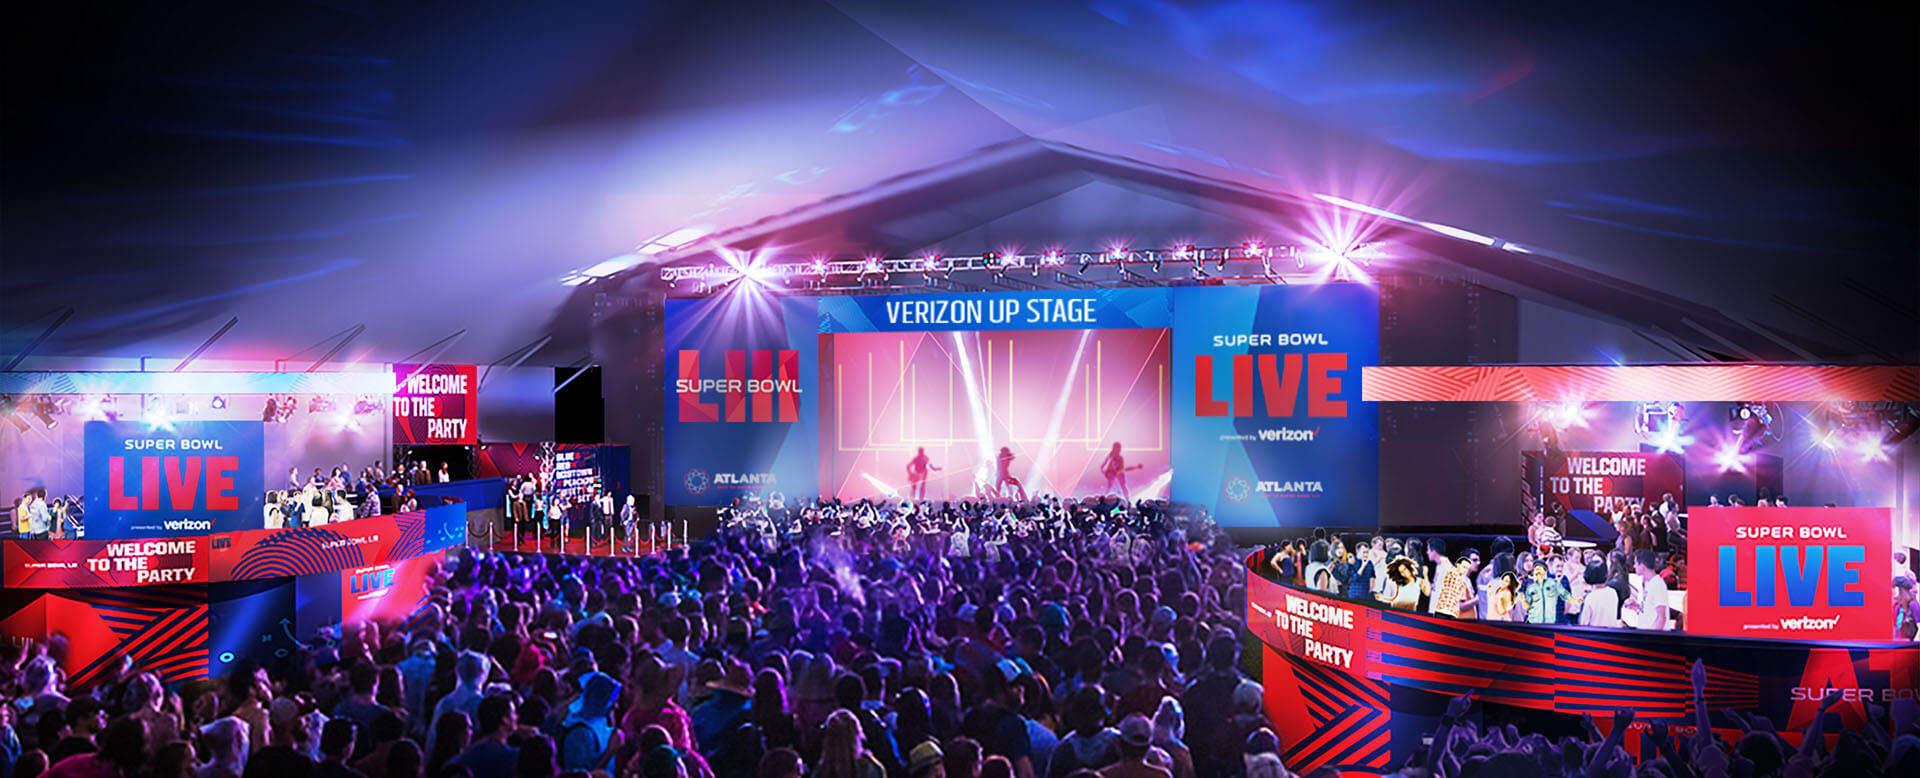 Super Bowl Live presented by Verizon